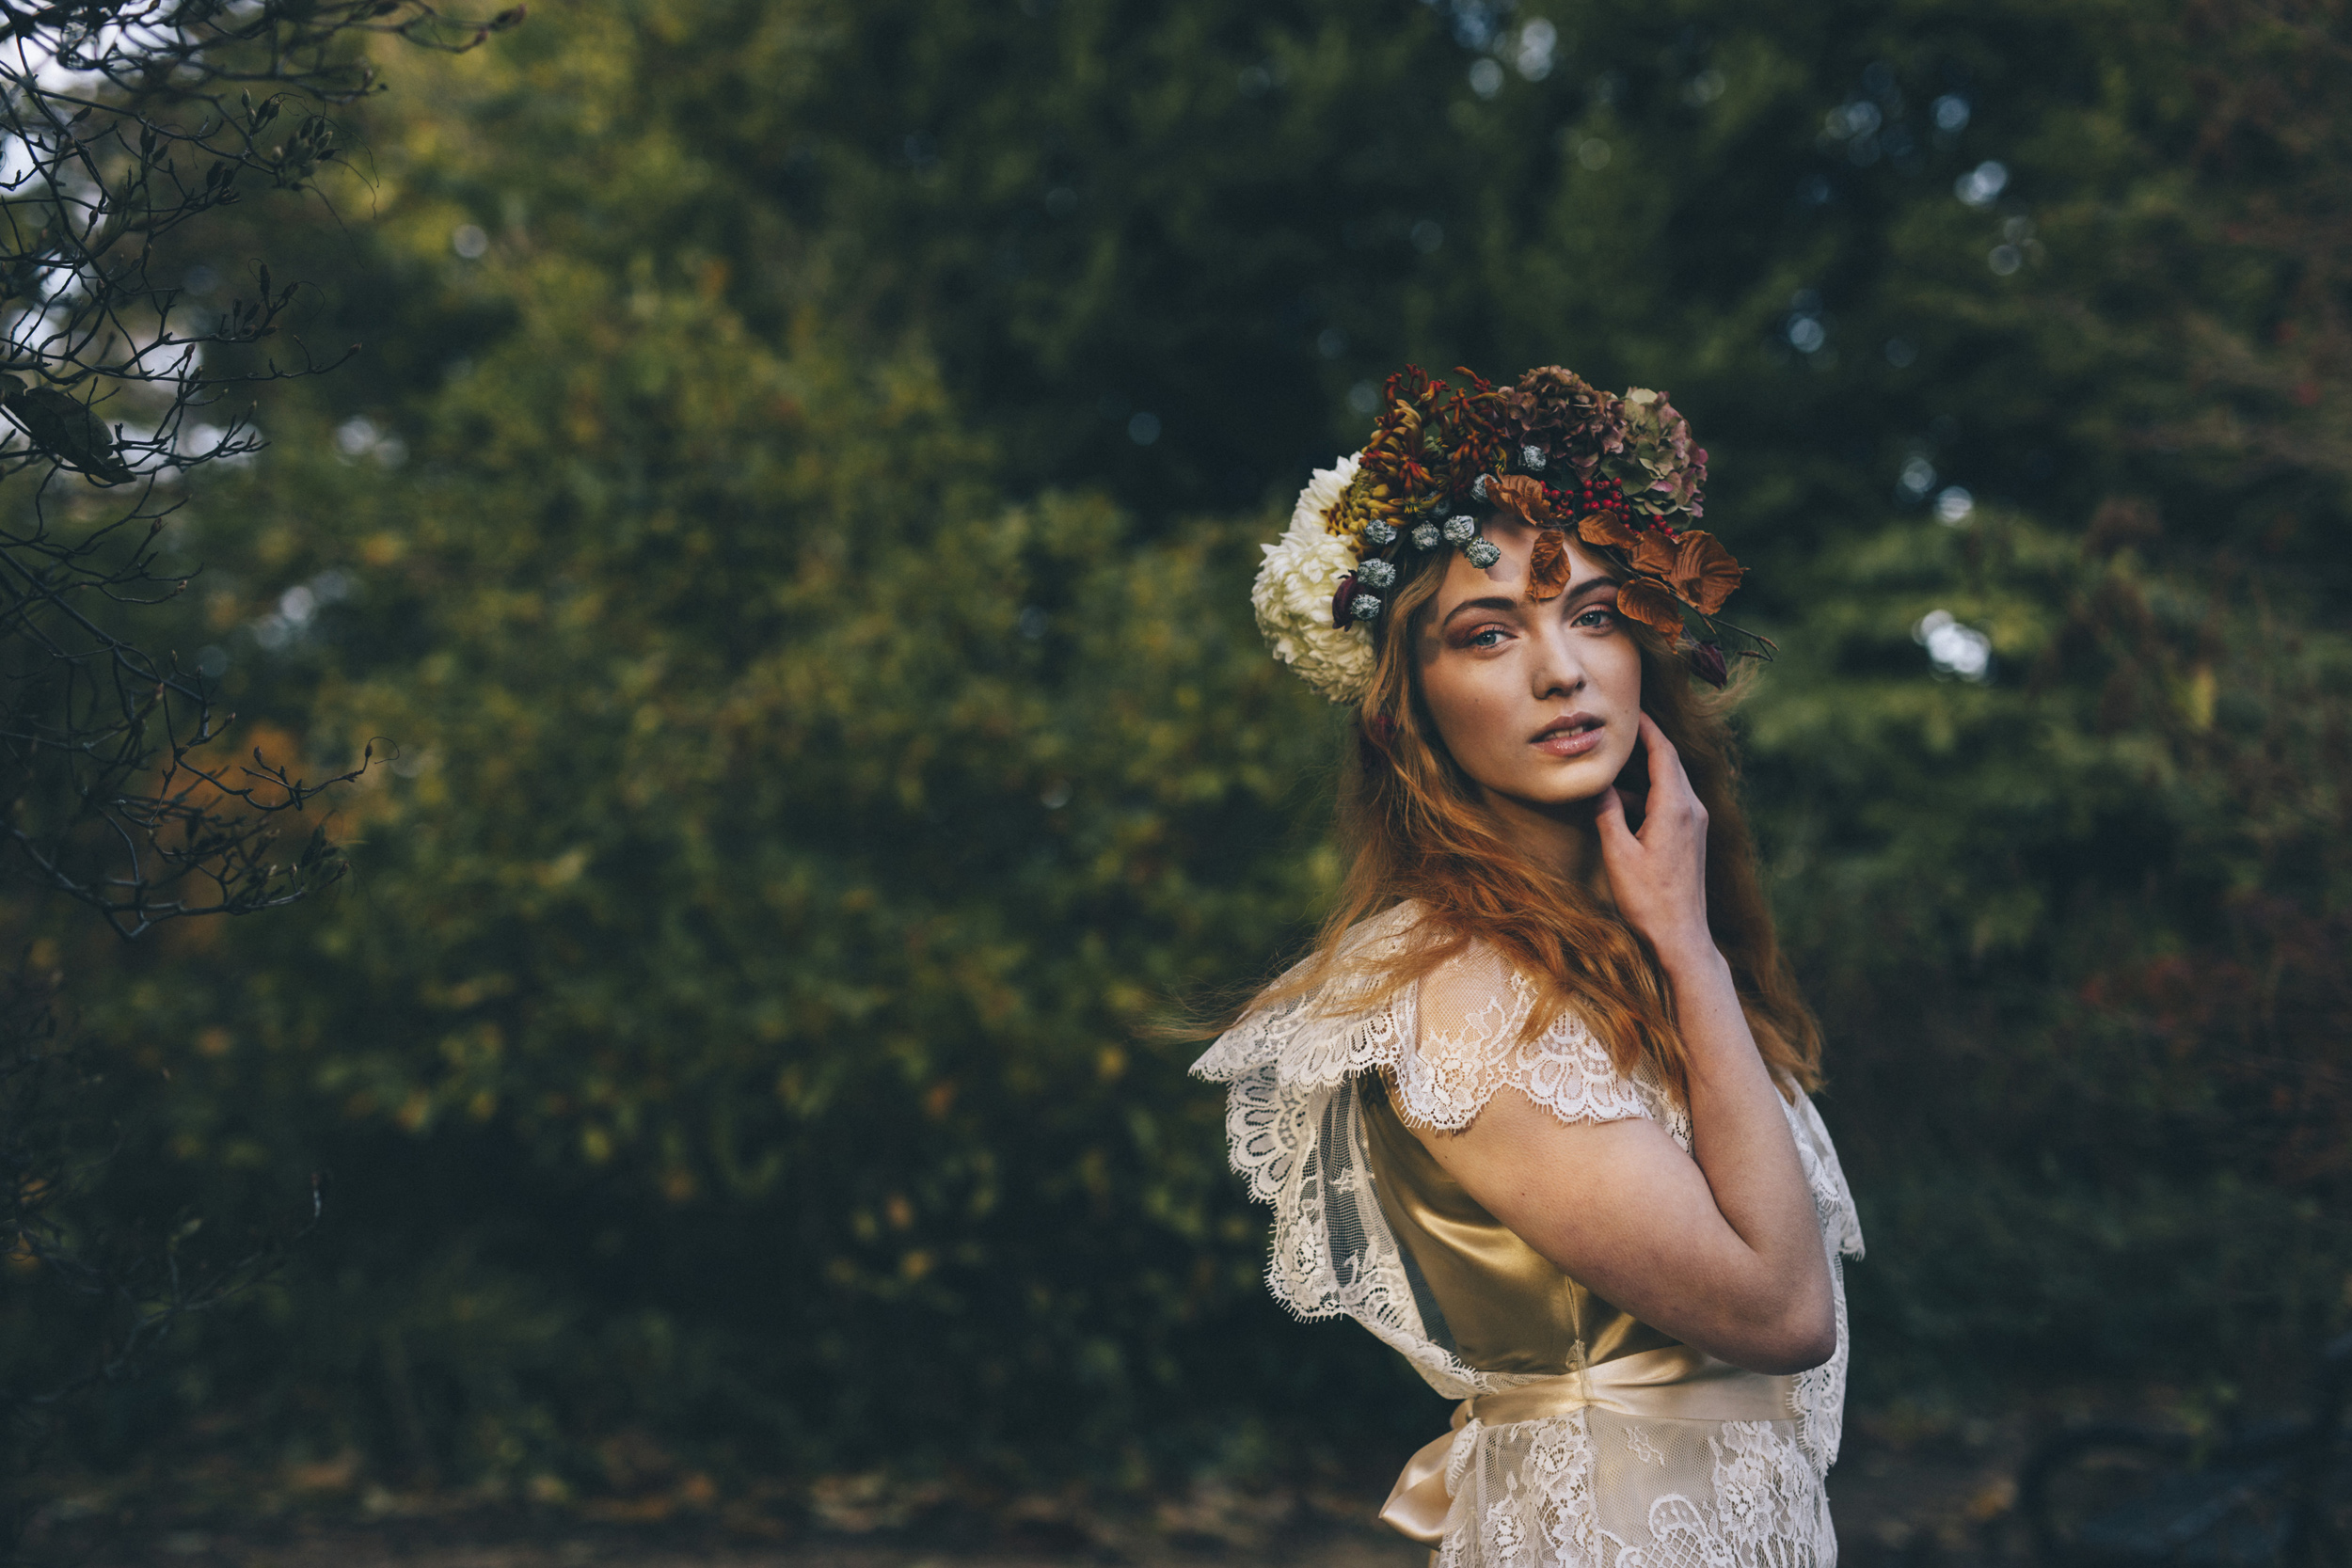 Autumn-Leaves-Shelley-Richmond-Kate-Beaumont-Sheffield-11.jpg